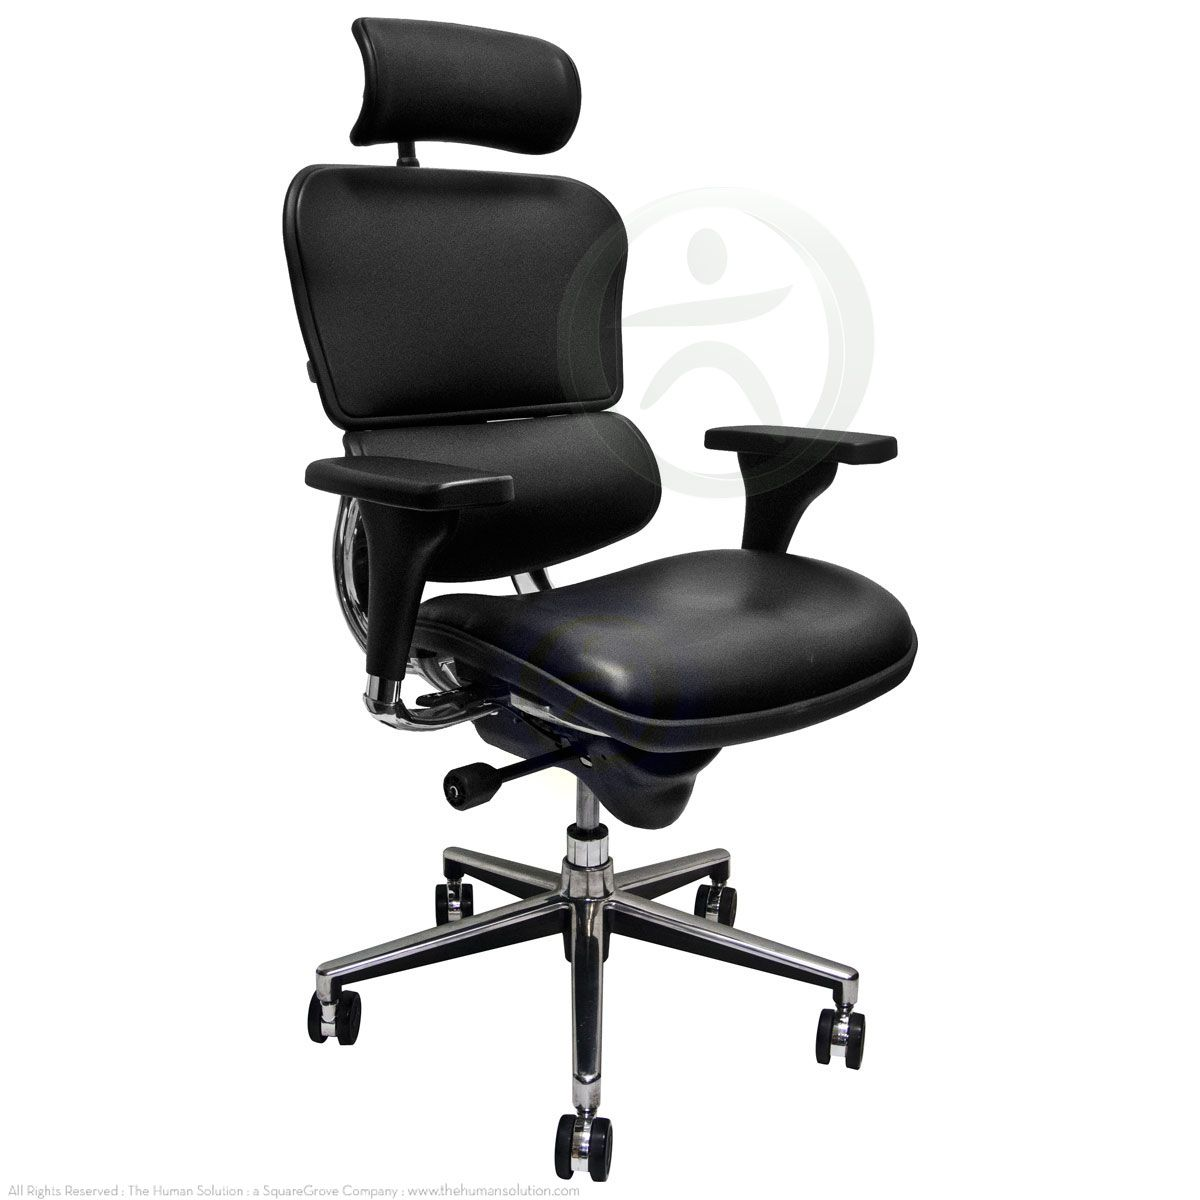 The Le9erg Raynor Ergohuman Chair With A High Back And